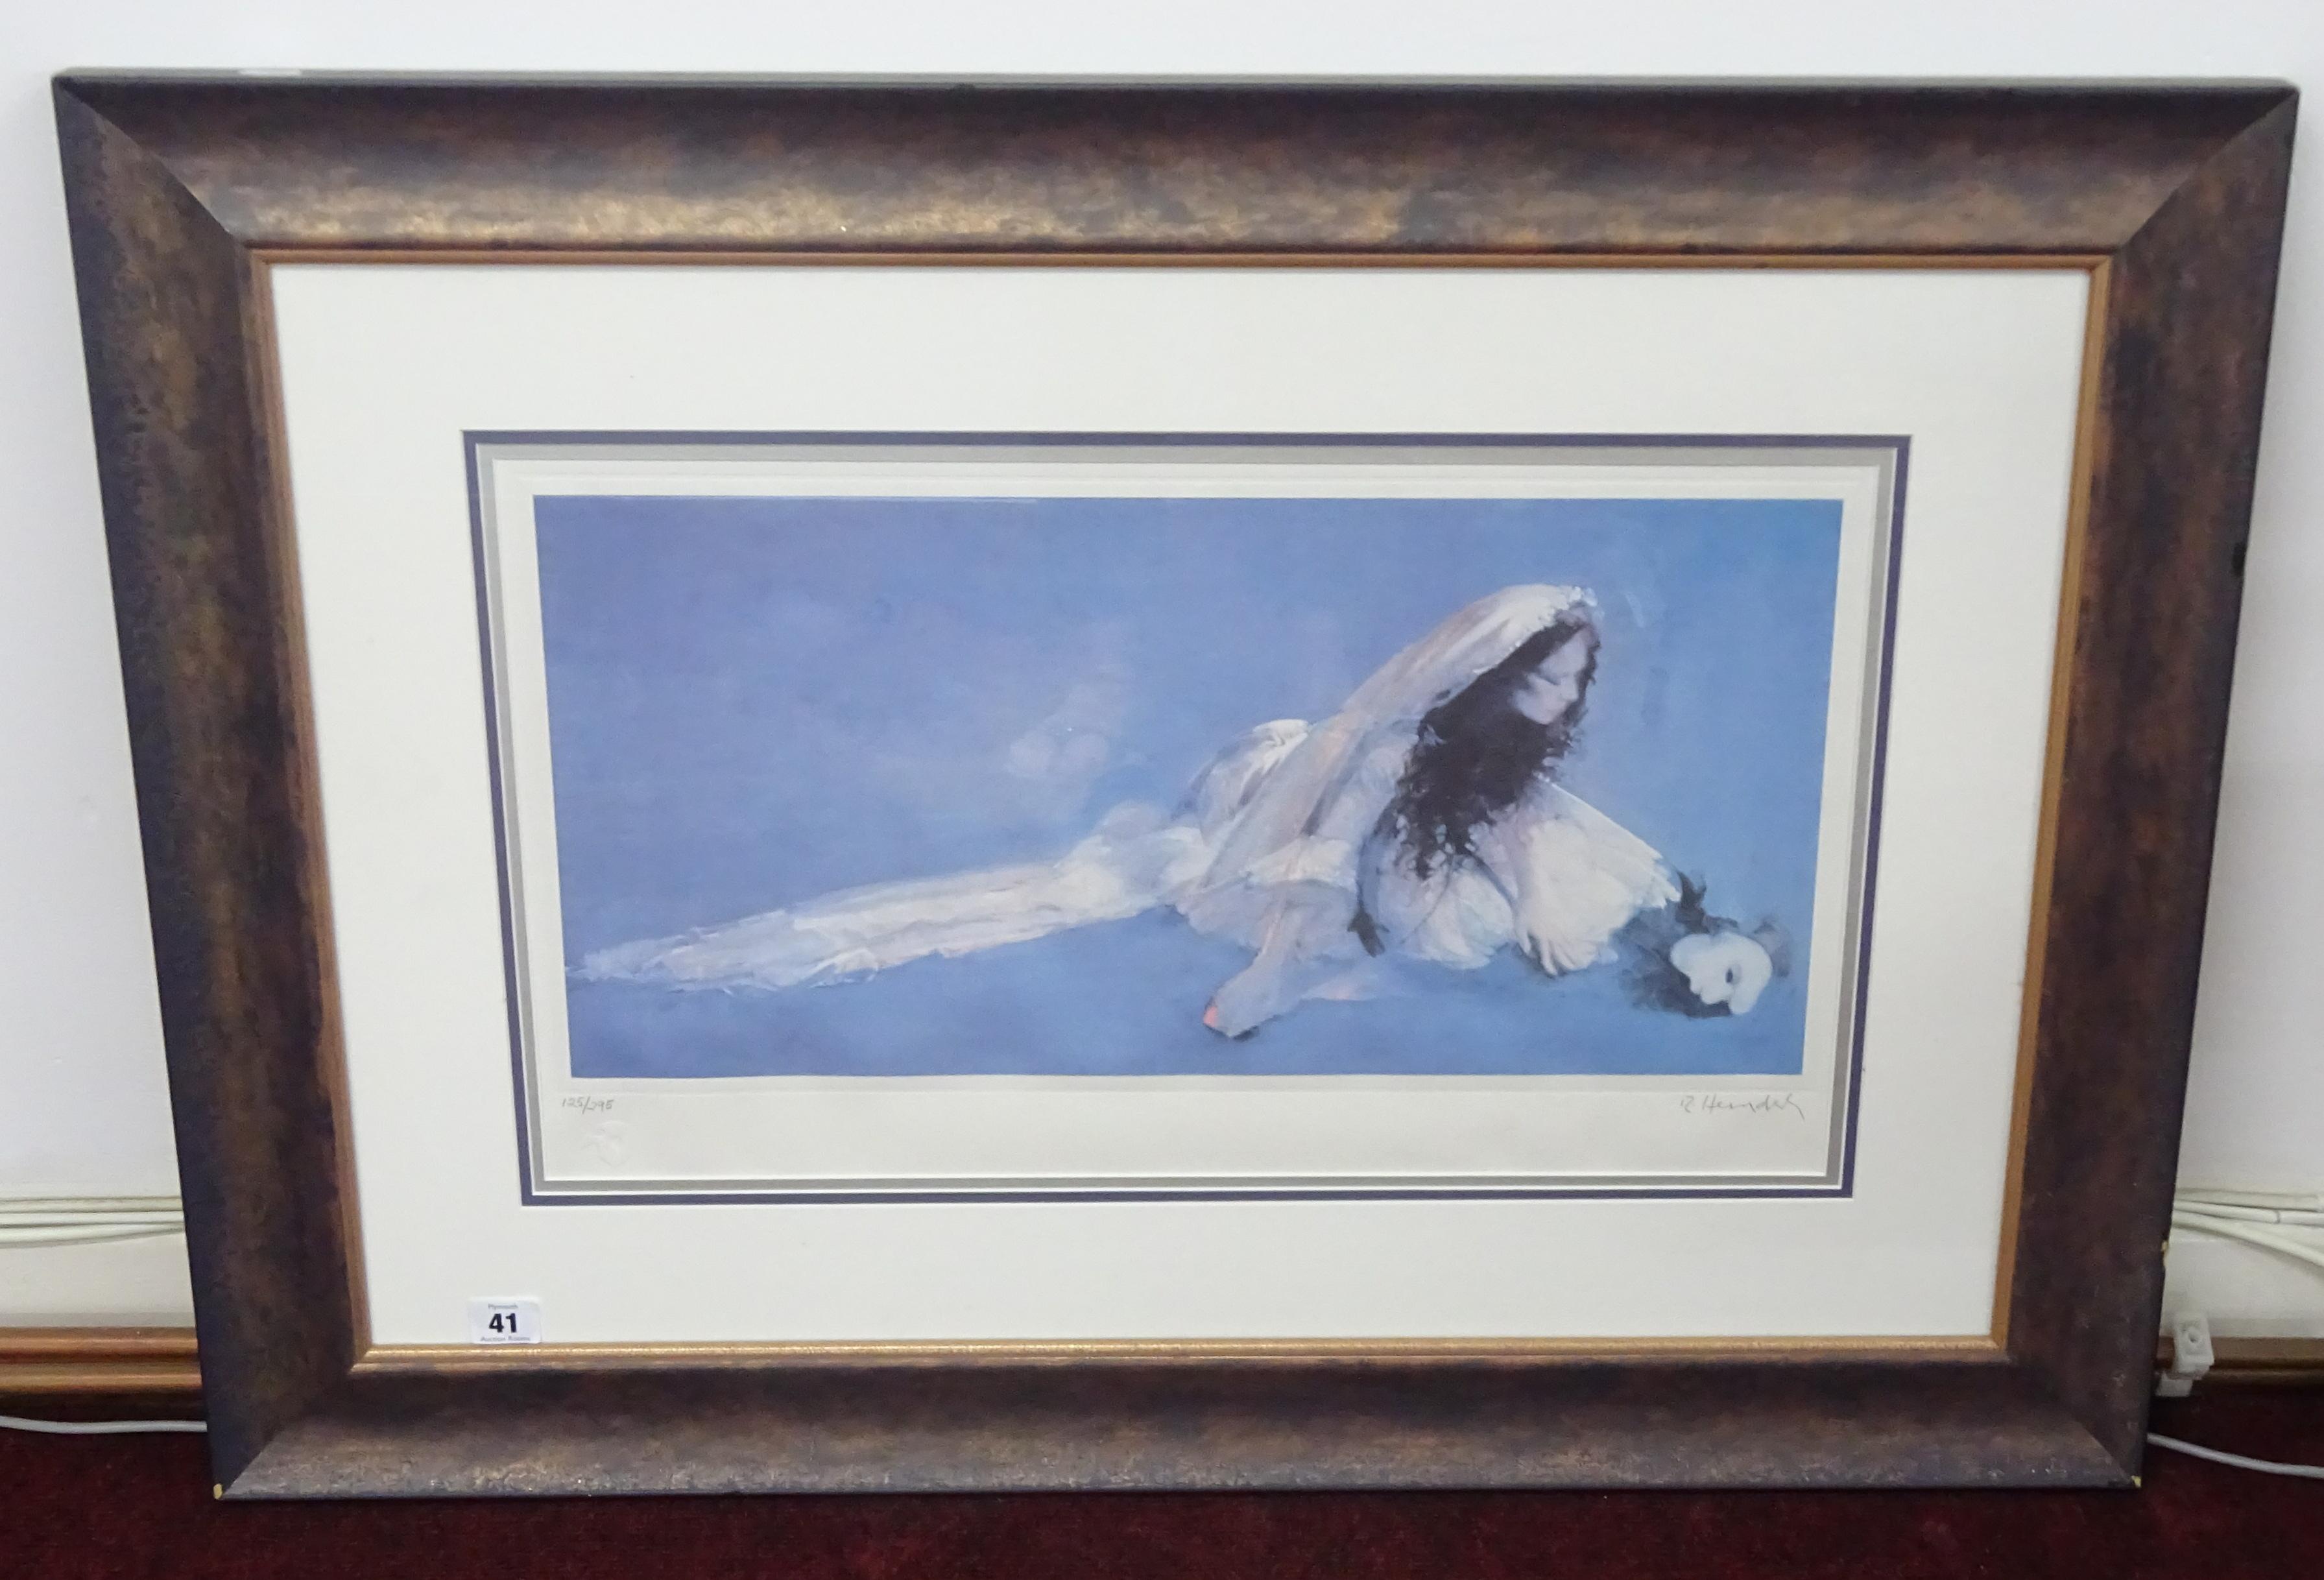 Lot 041 - Robert Heindel (American 1938 - 2005) signed limited edition print, number 125/295 untitled, 34cm